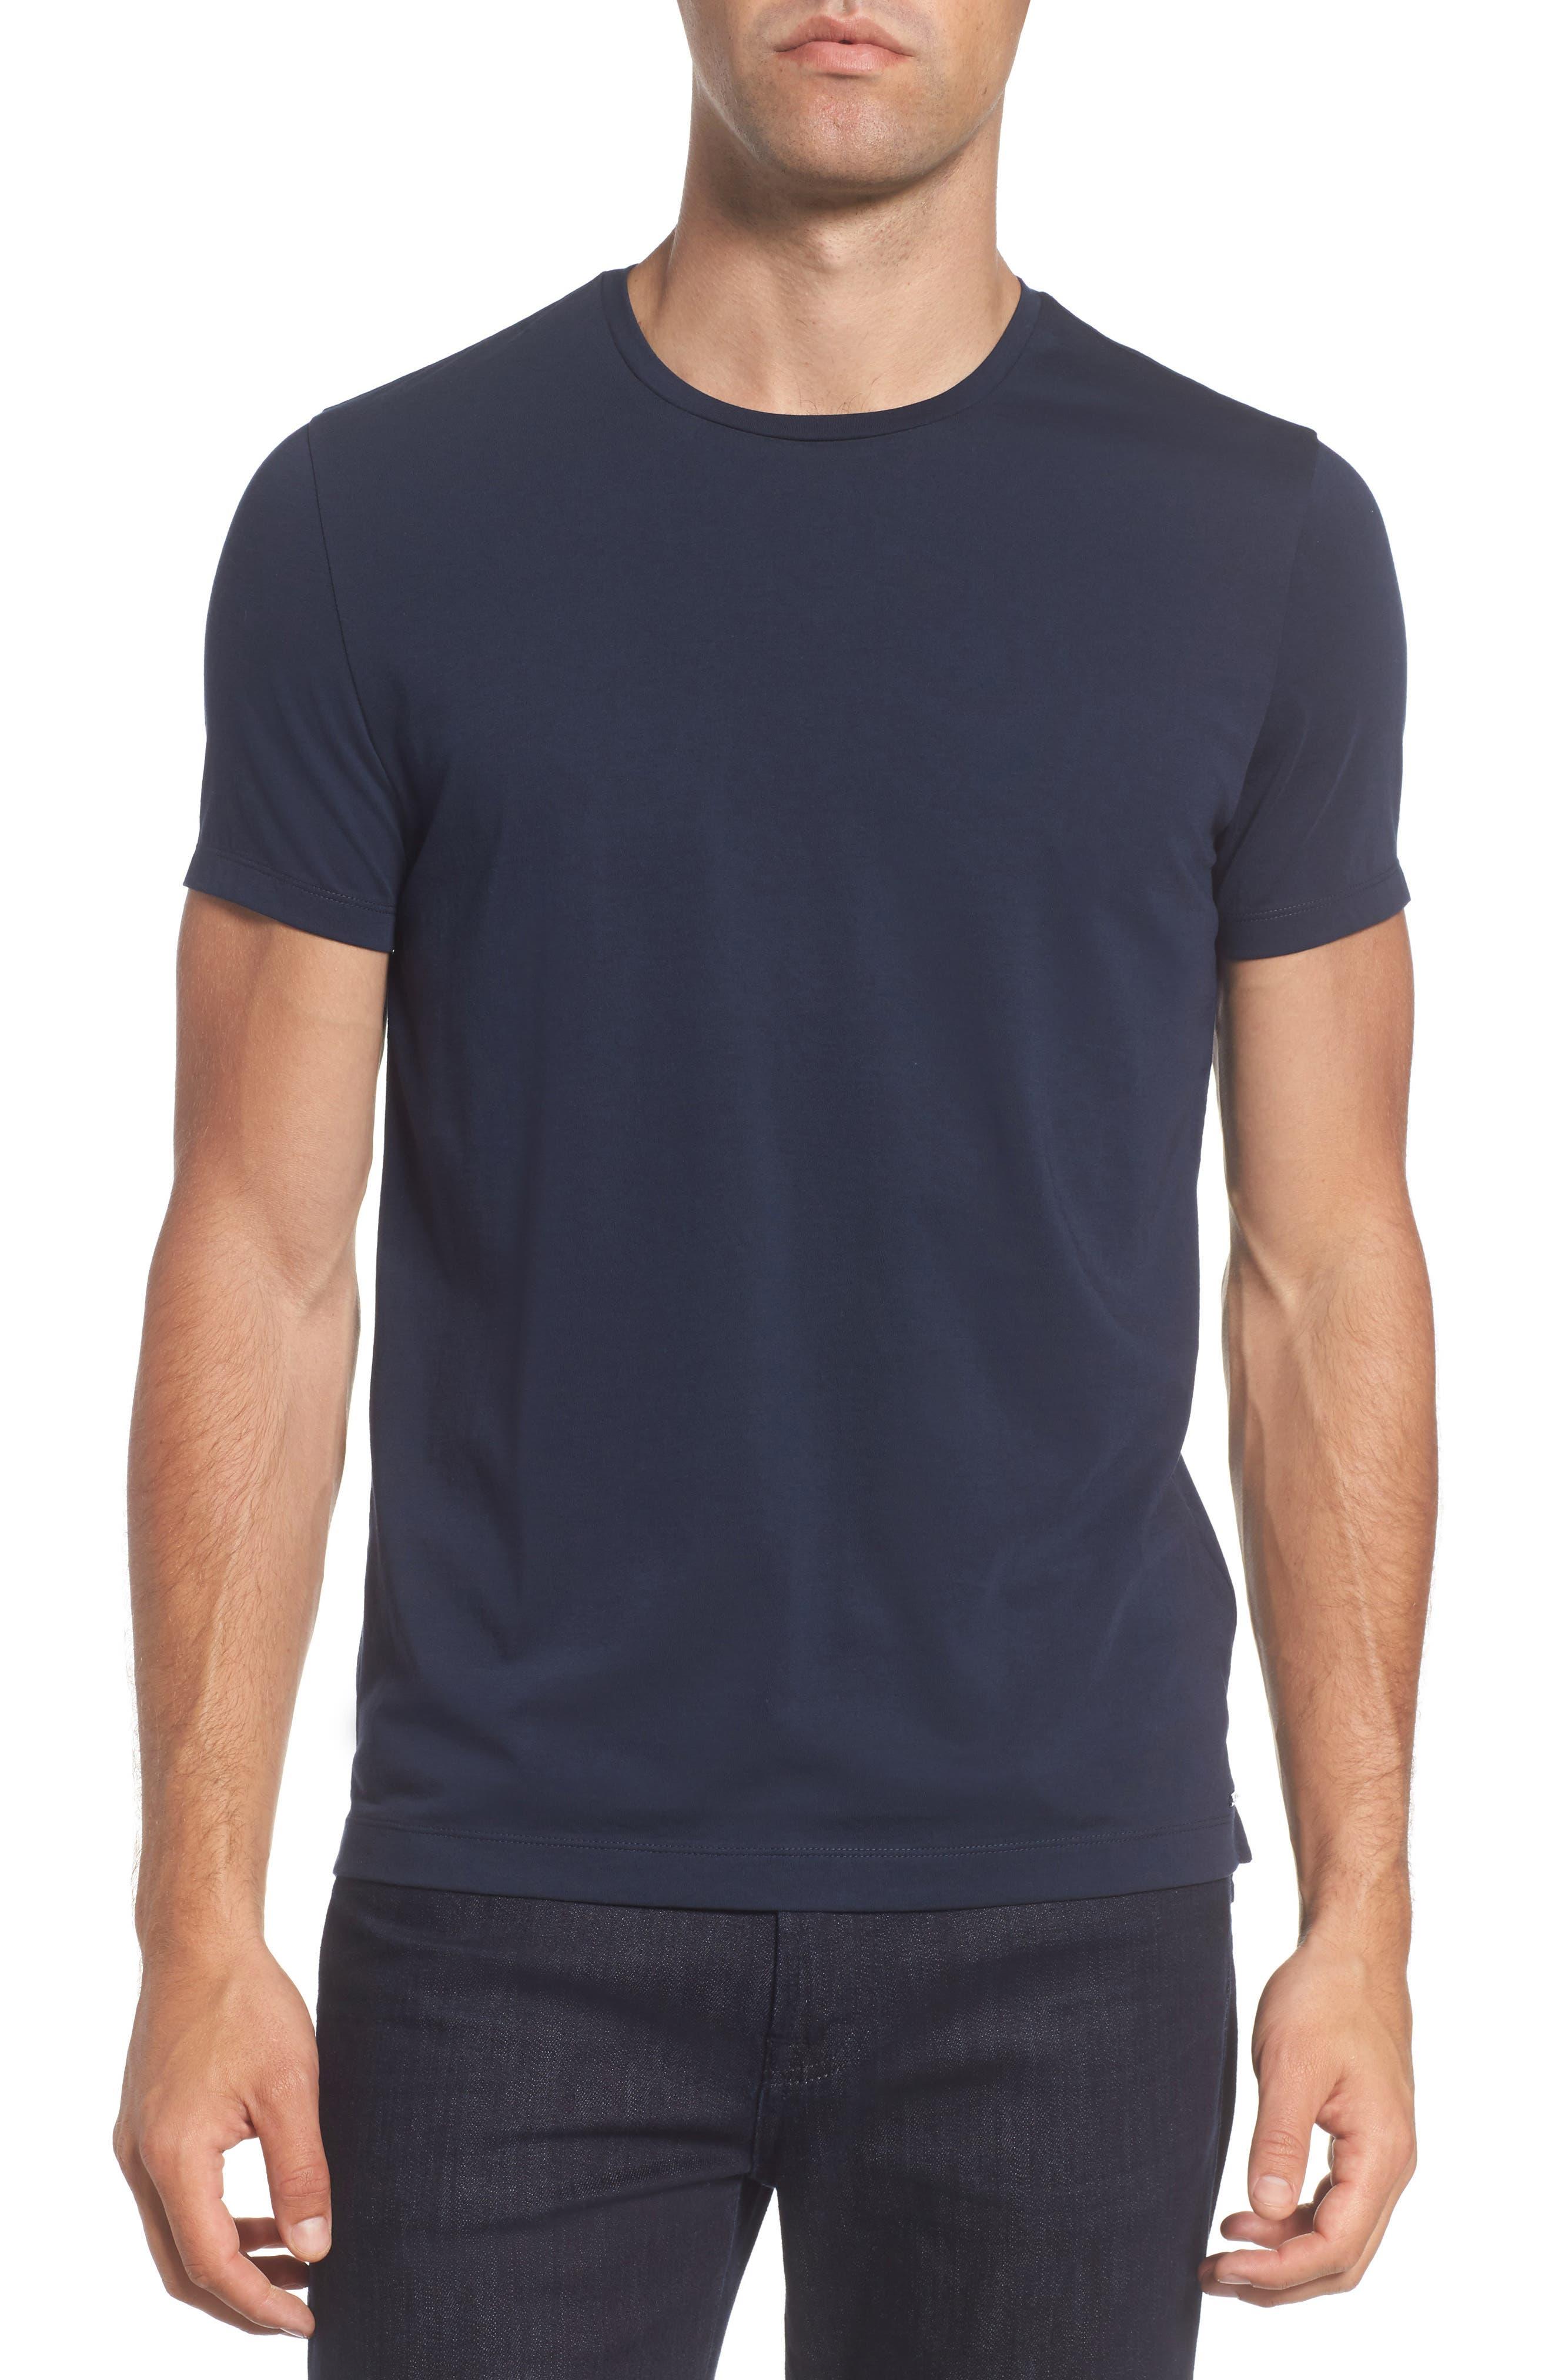 Tessler Crewneck T-Shirt,                             Main thumbnail 1, color,                             Black